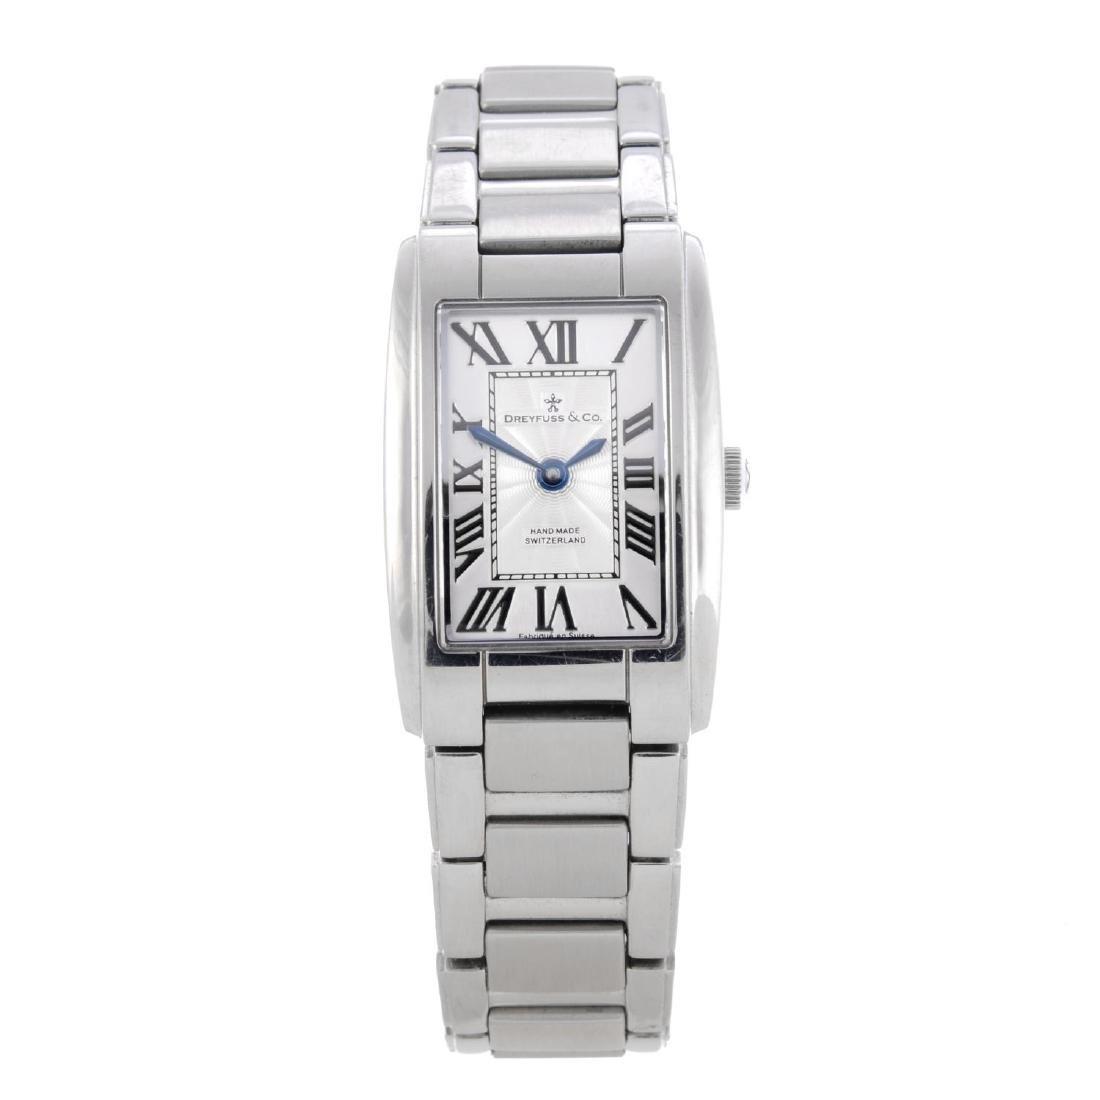 DREYFUSS & CO. - a lady's bracelet watch. Stainless